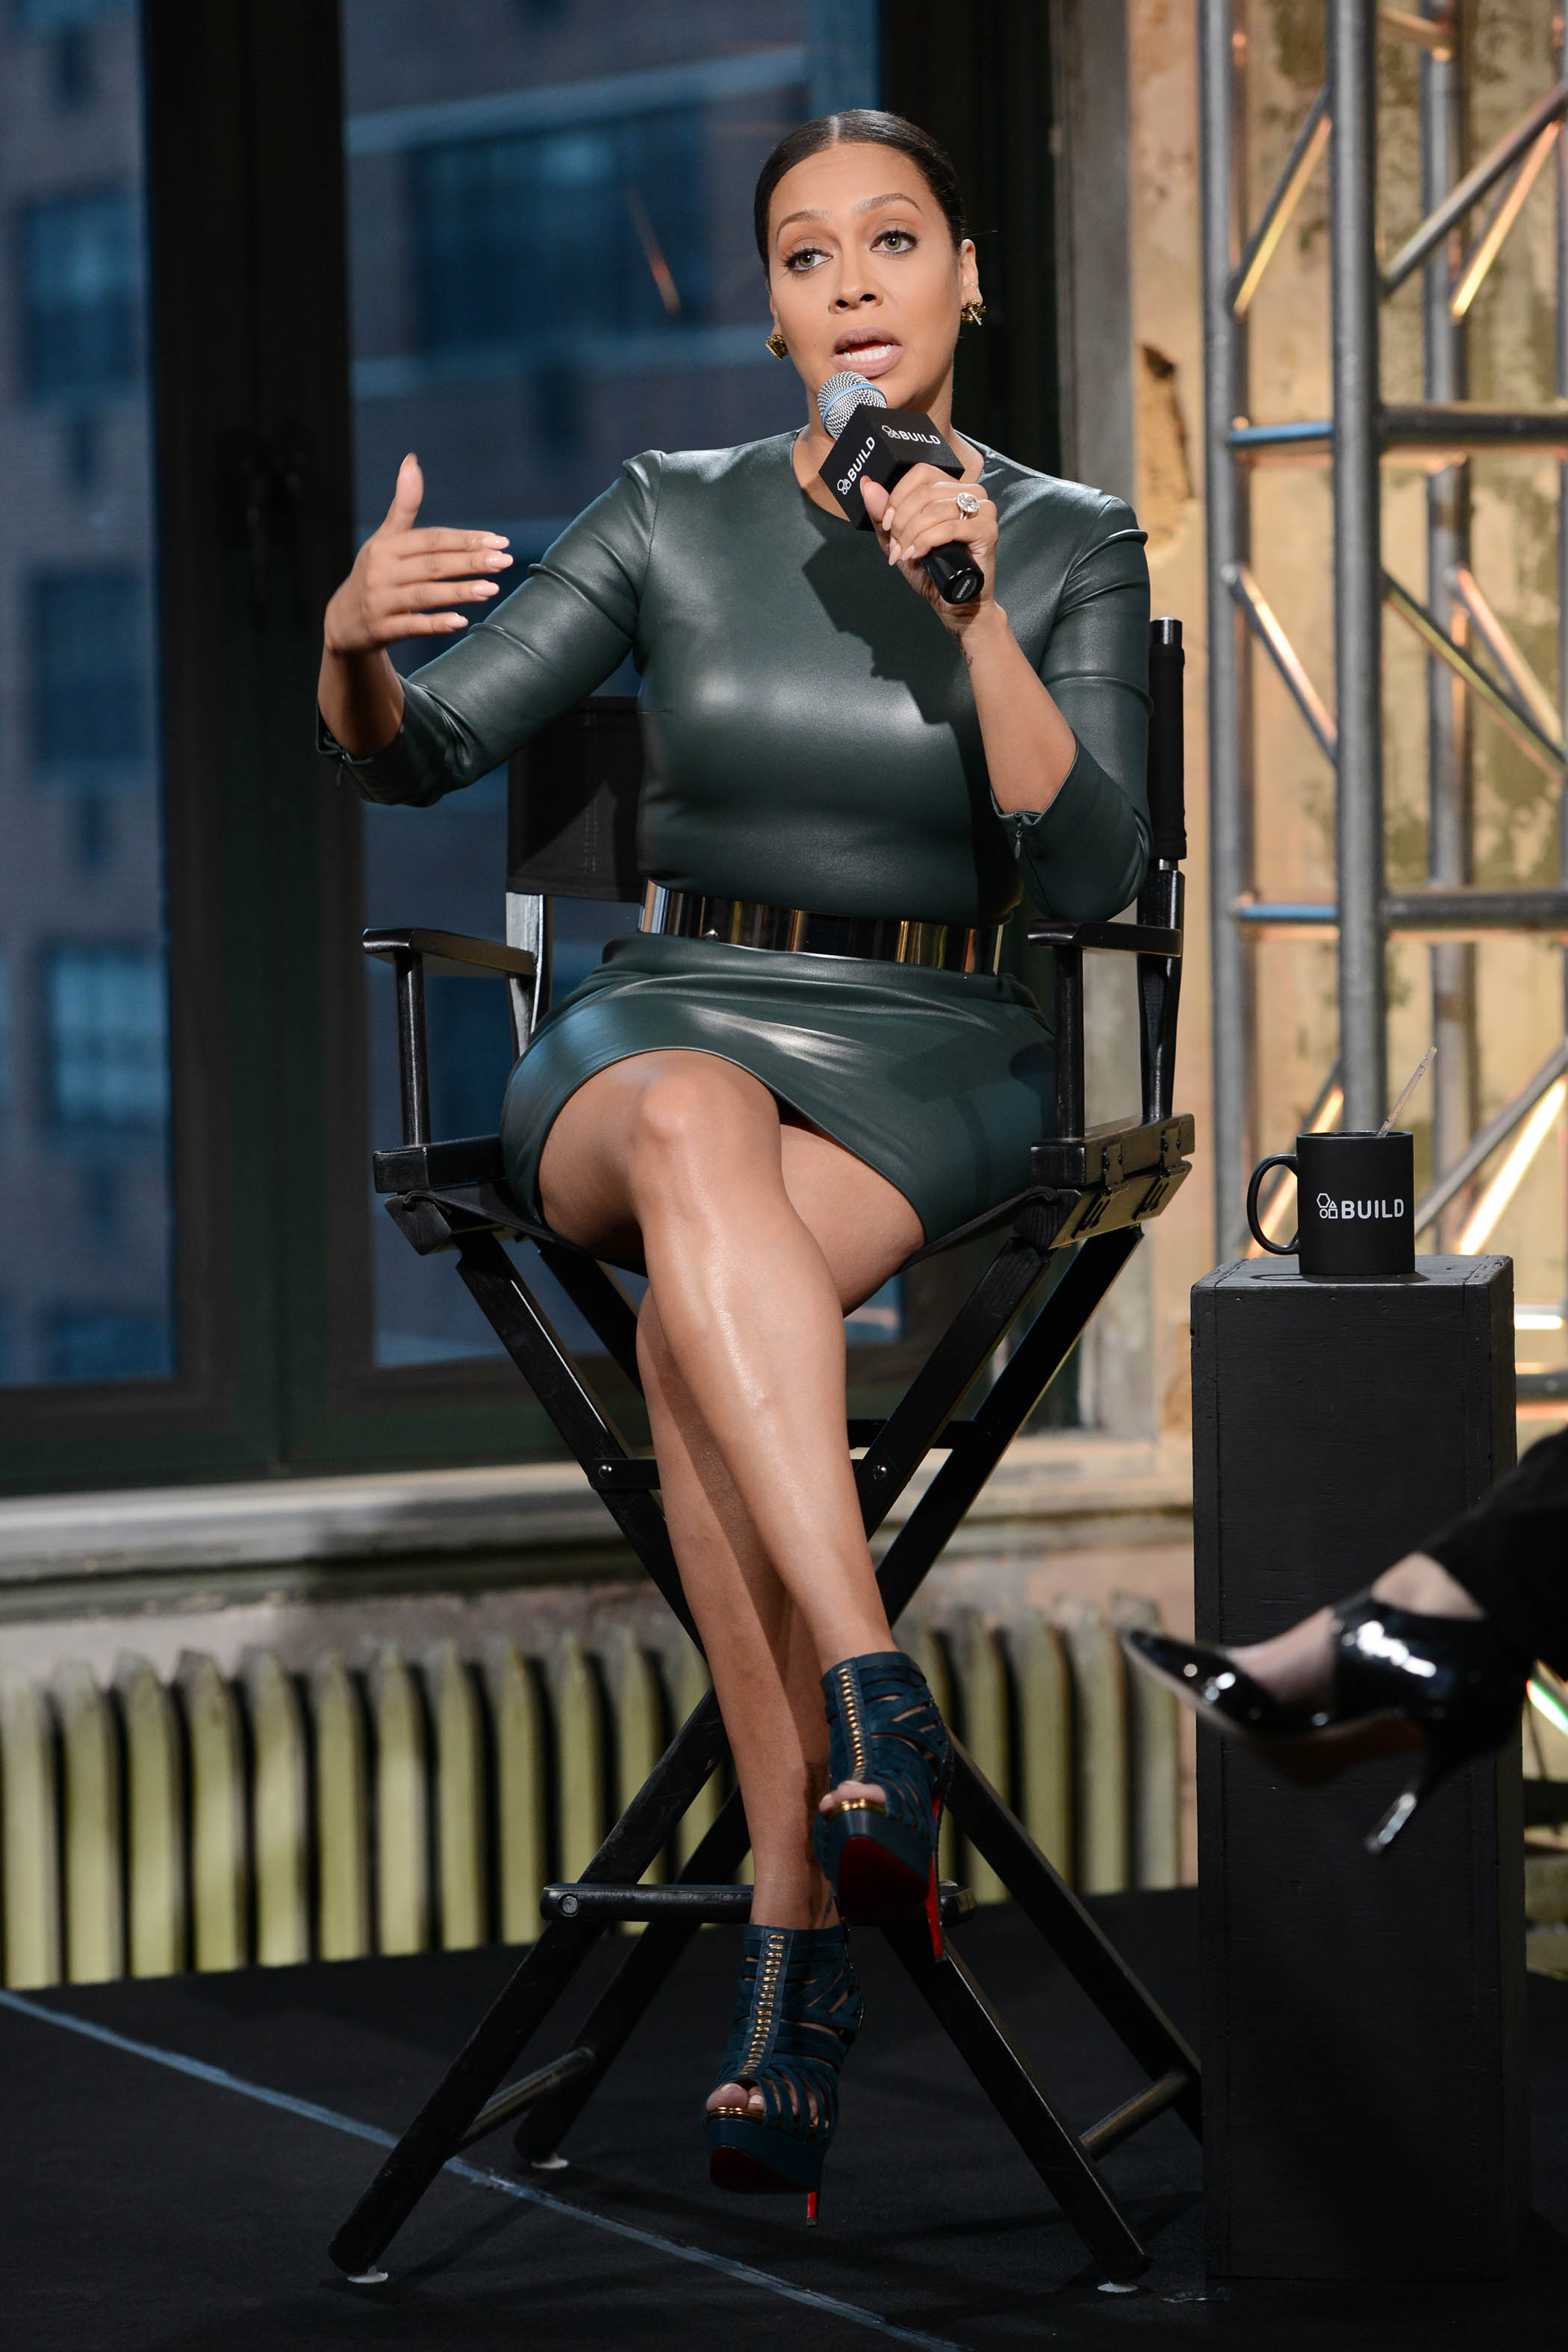 La La Anthony discusses the new Season of Unforgettable